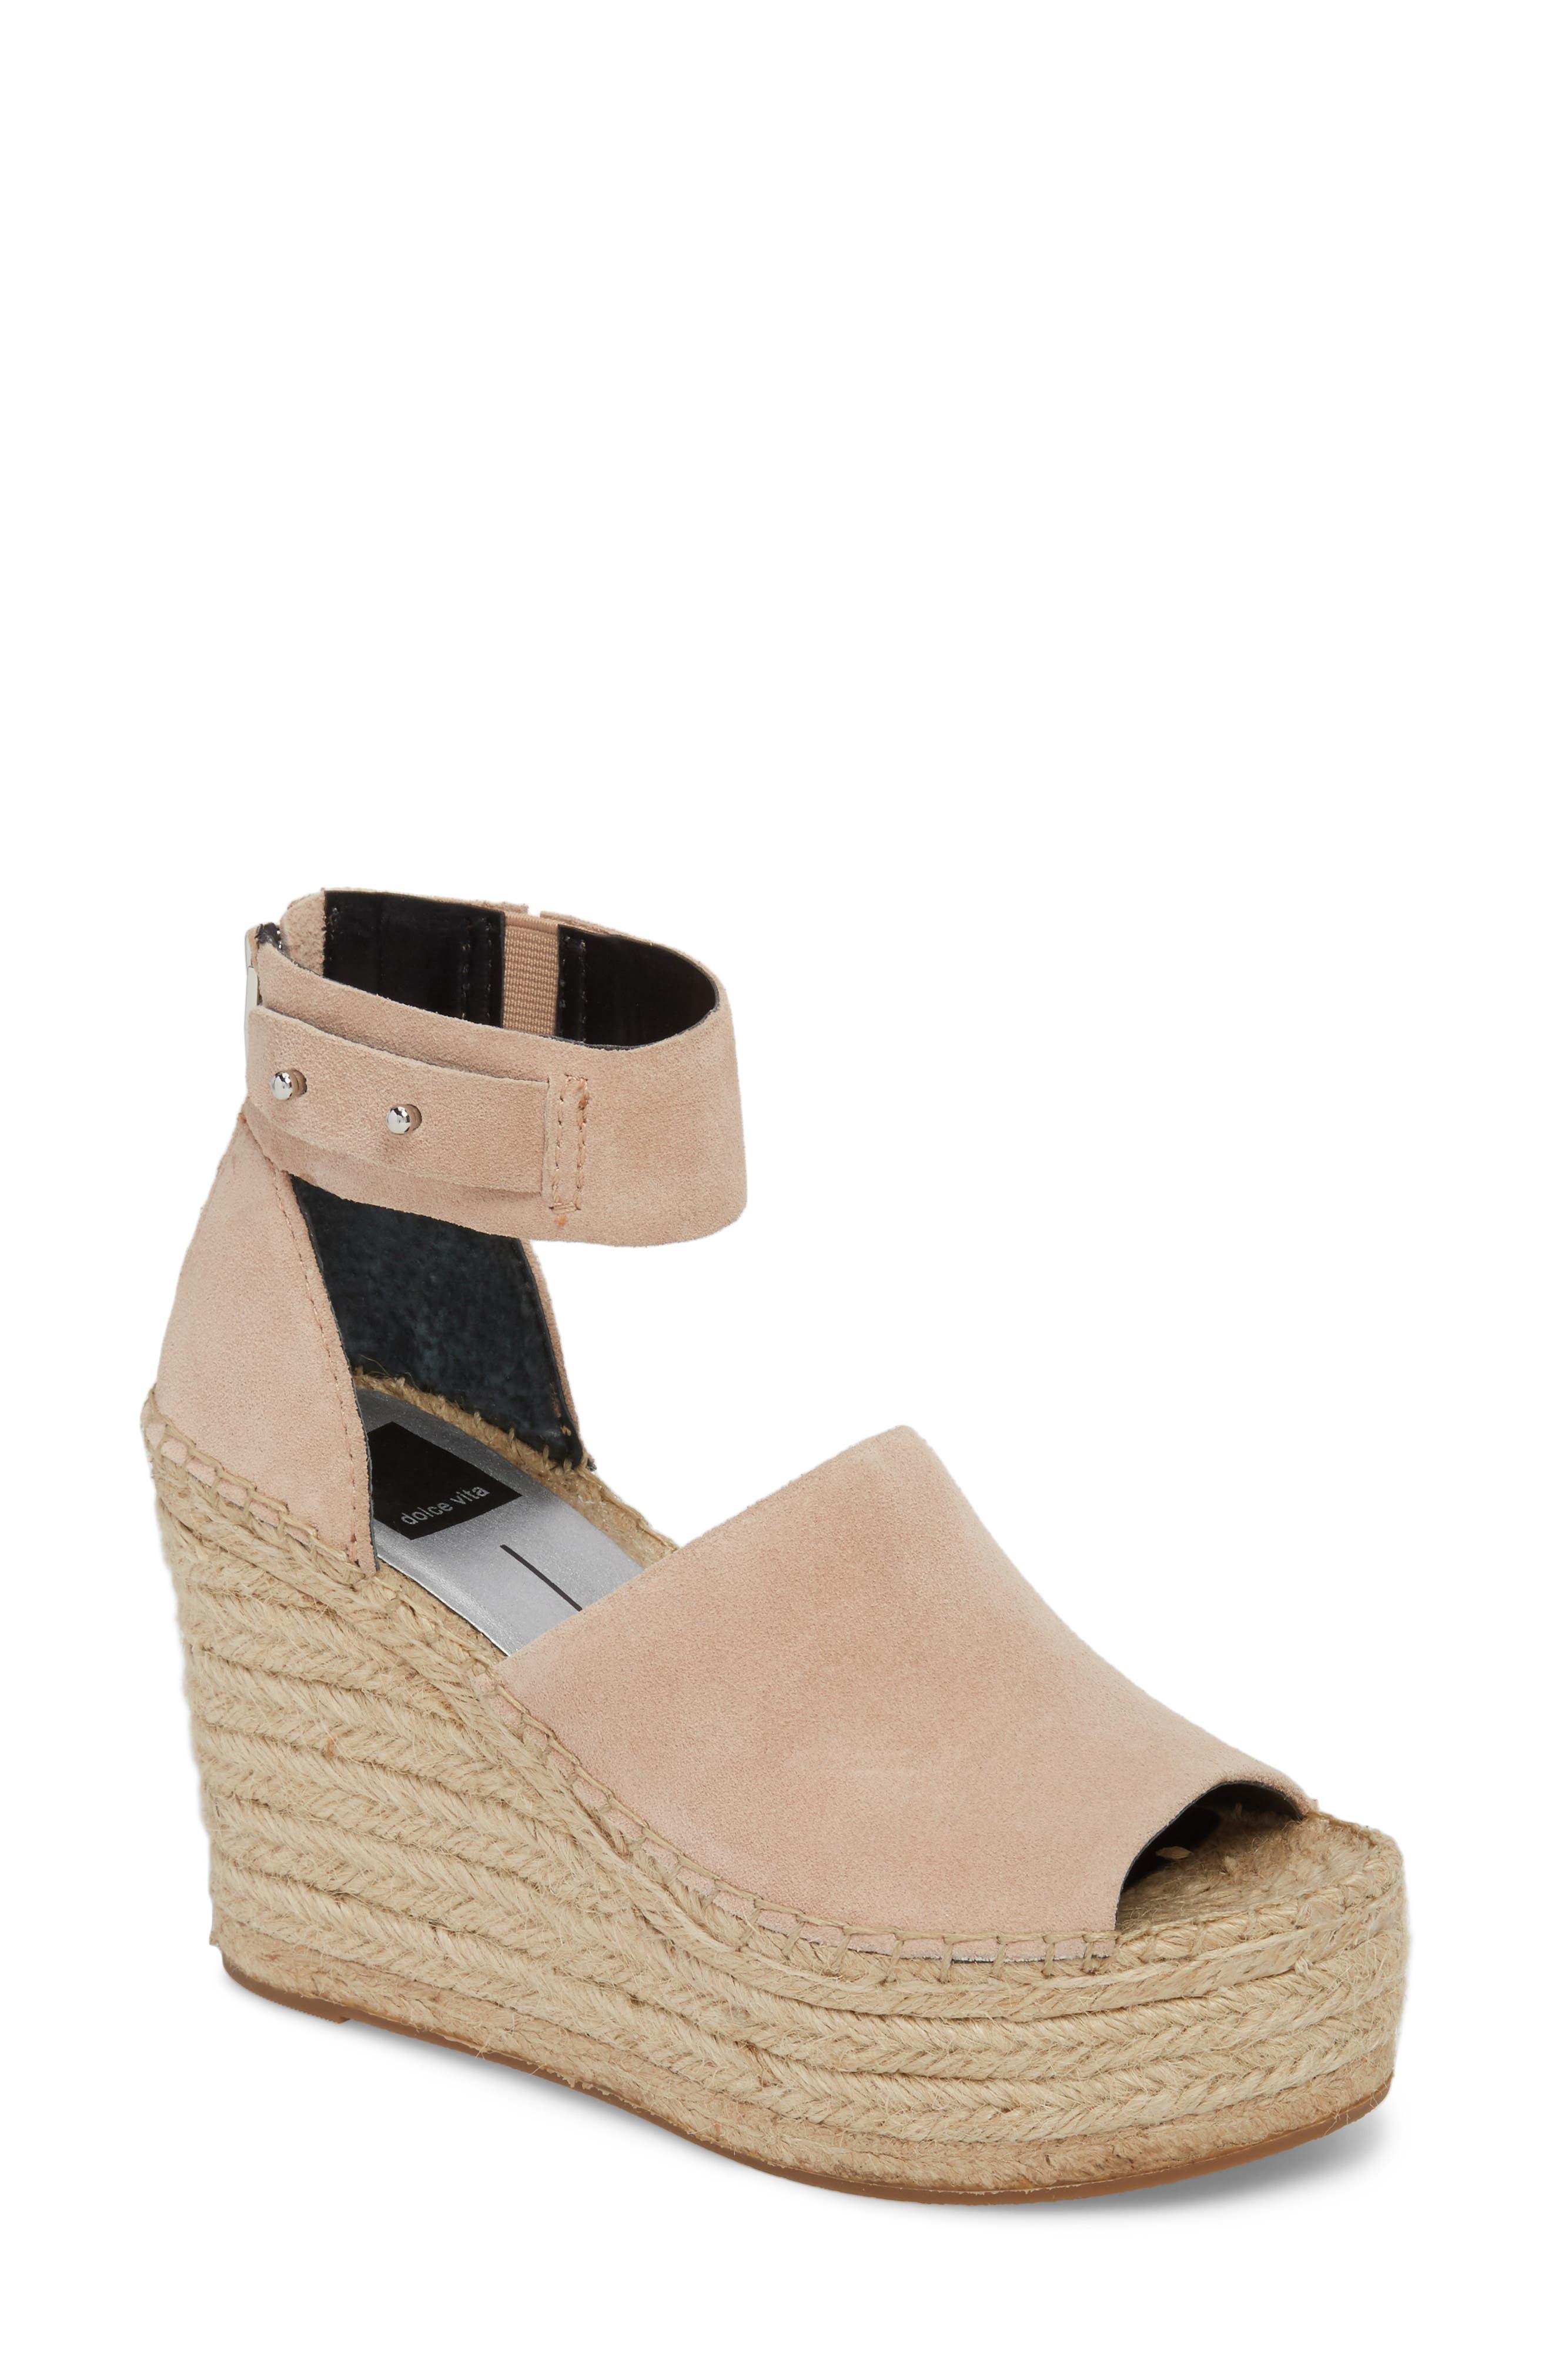 Dolce Vita Straw Wedge Espadrille Sandal (Women)